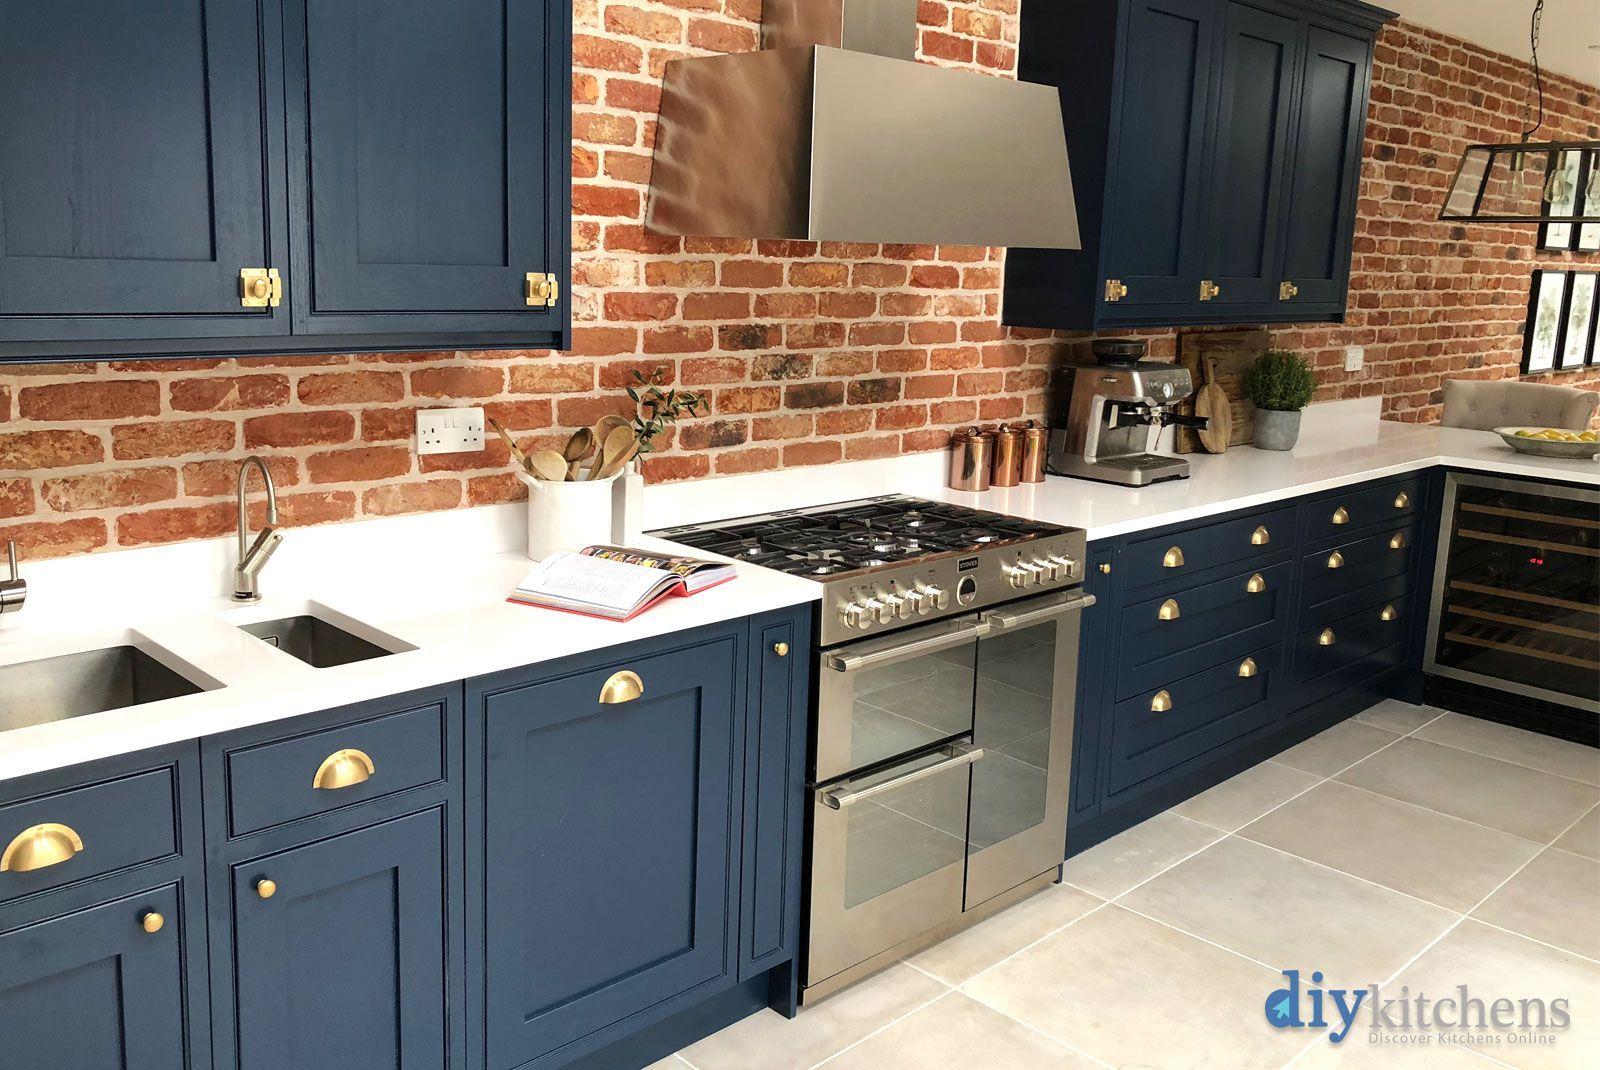 An Innova Helmsley Bespoke Painted Inframe Kitchen